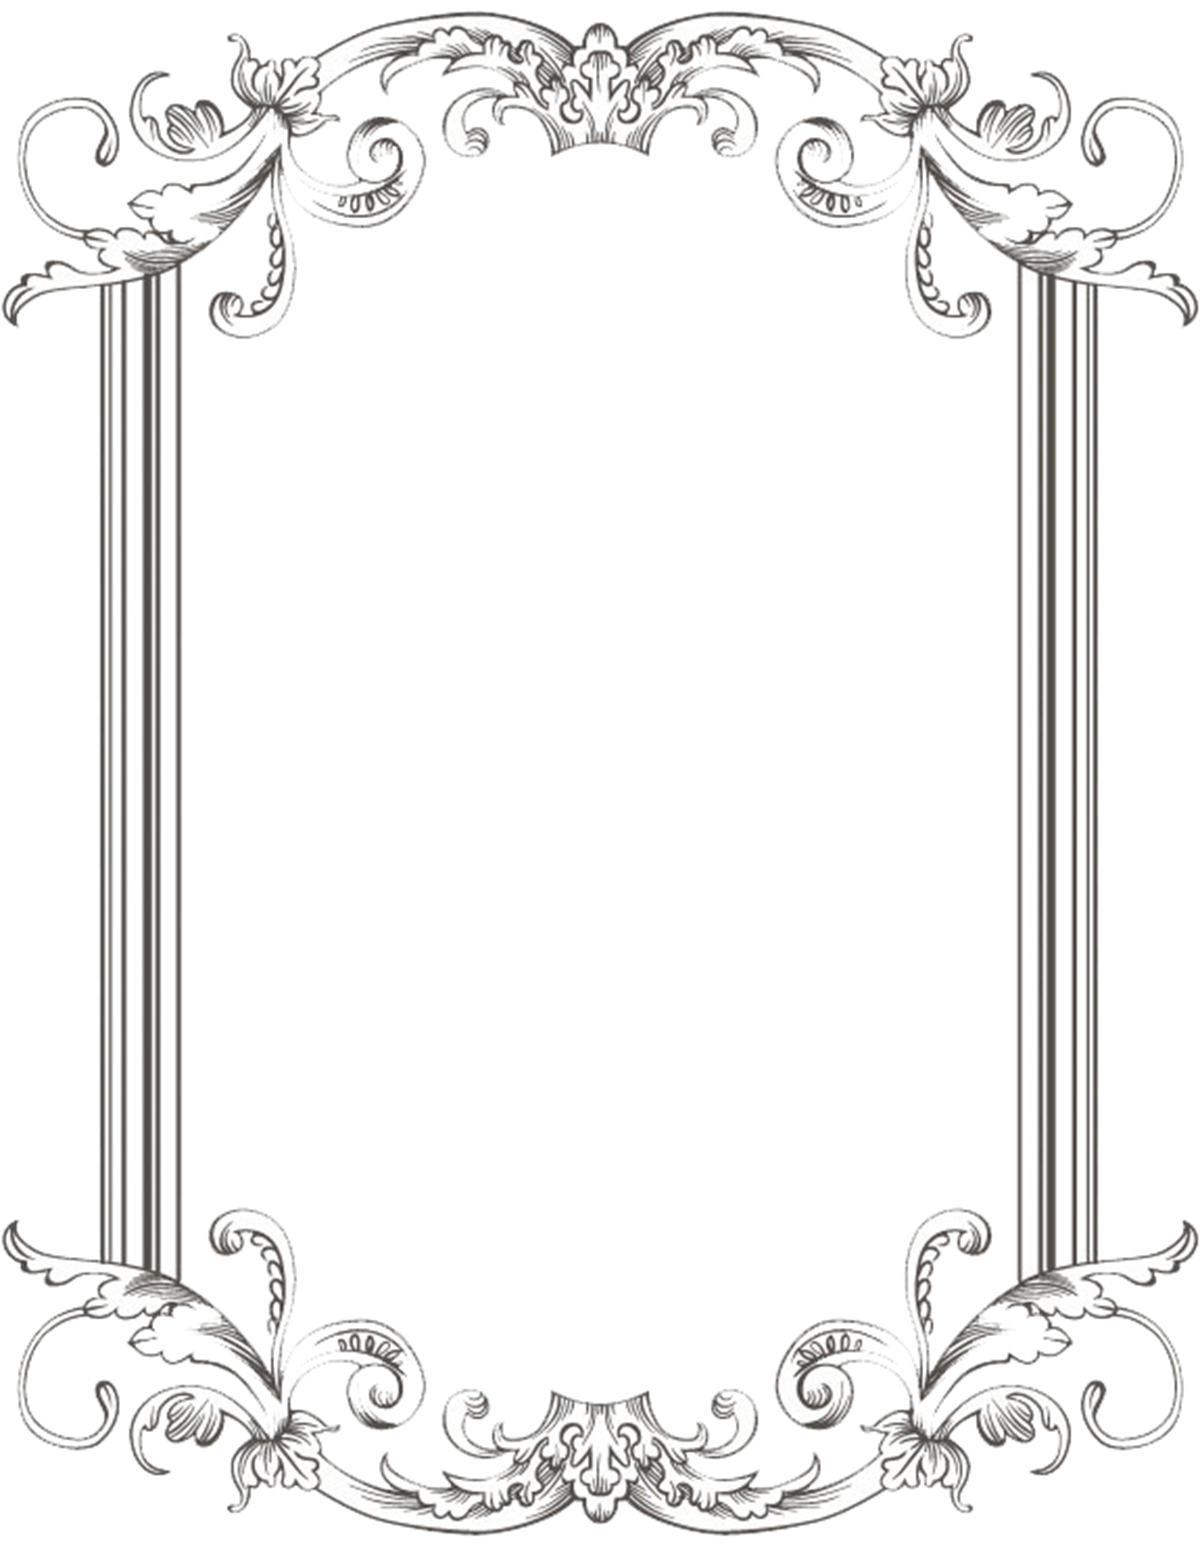 Custom Vintage Frame One by kingoftheswingers on ...